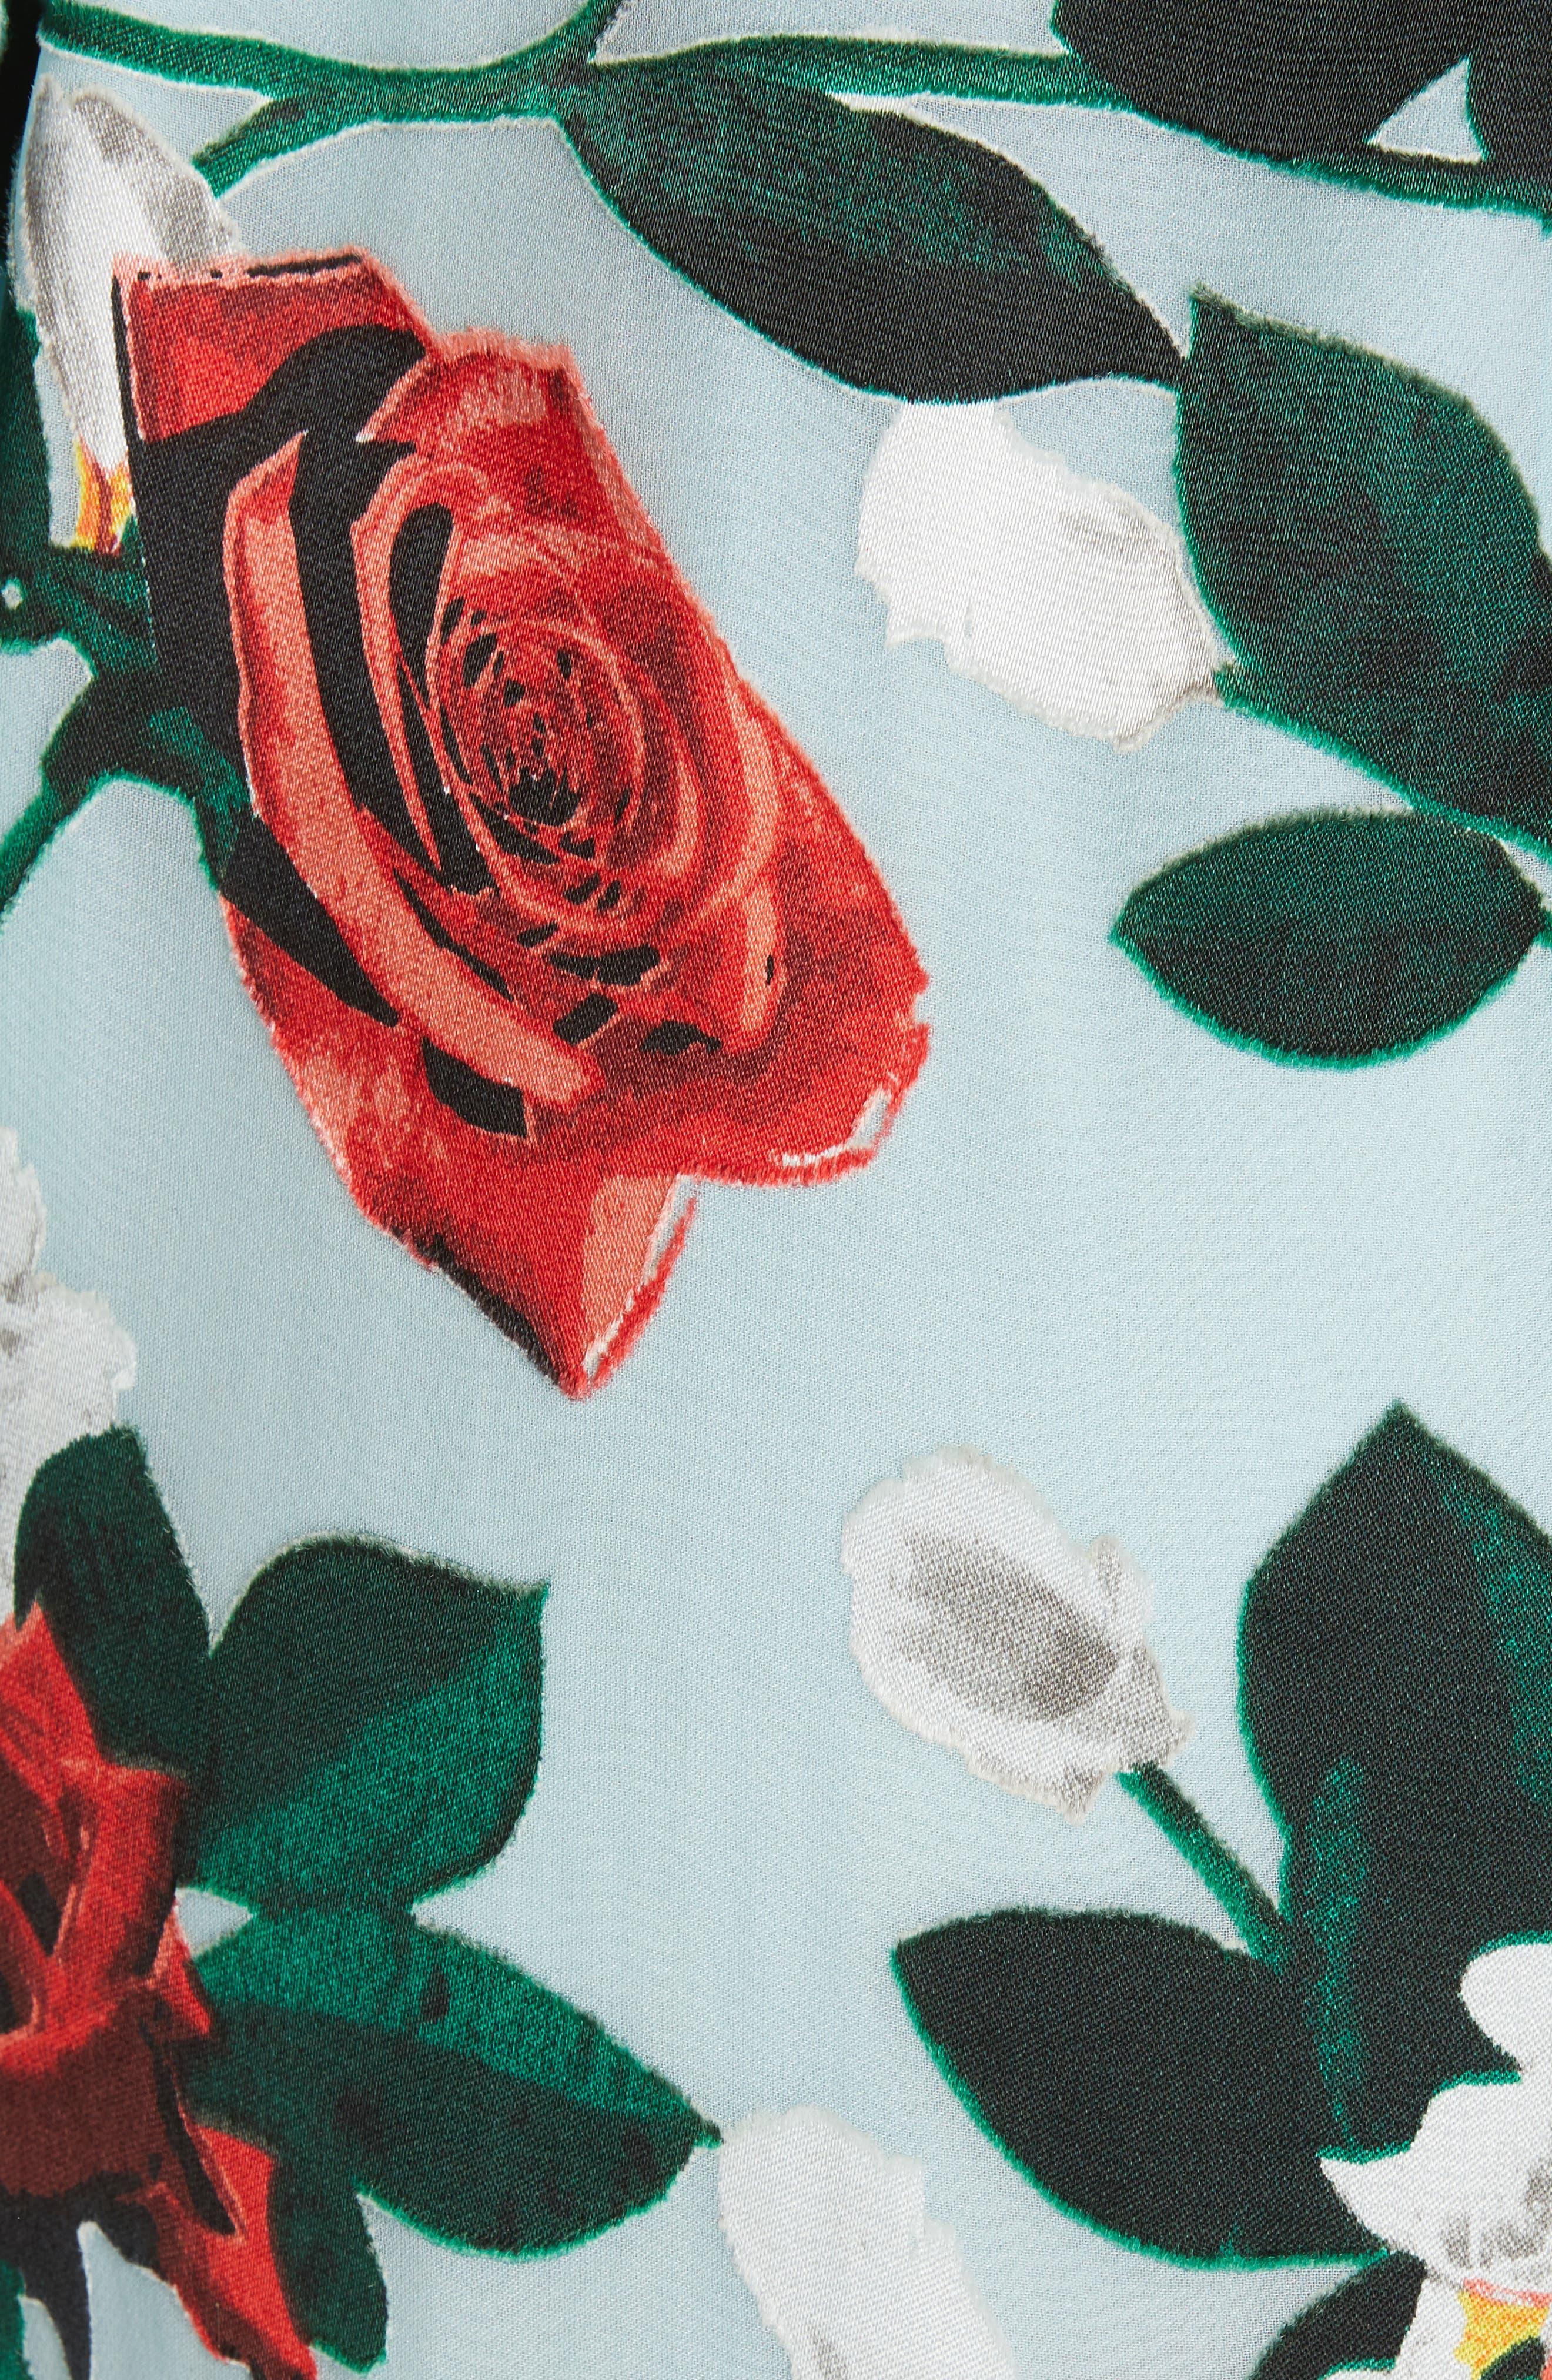 Ellamae Ruffle Sleeve Dress,                             Alternate thumbnail 5, color,                             ROSEBUD FLORAL POWDER BLUE